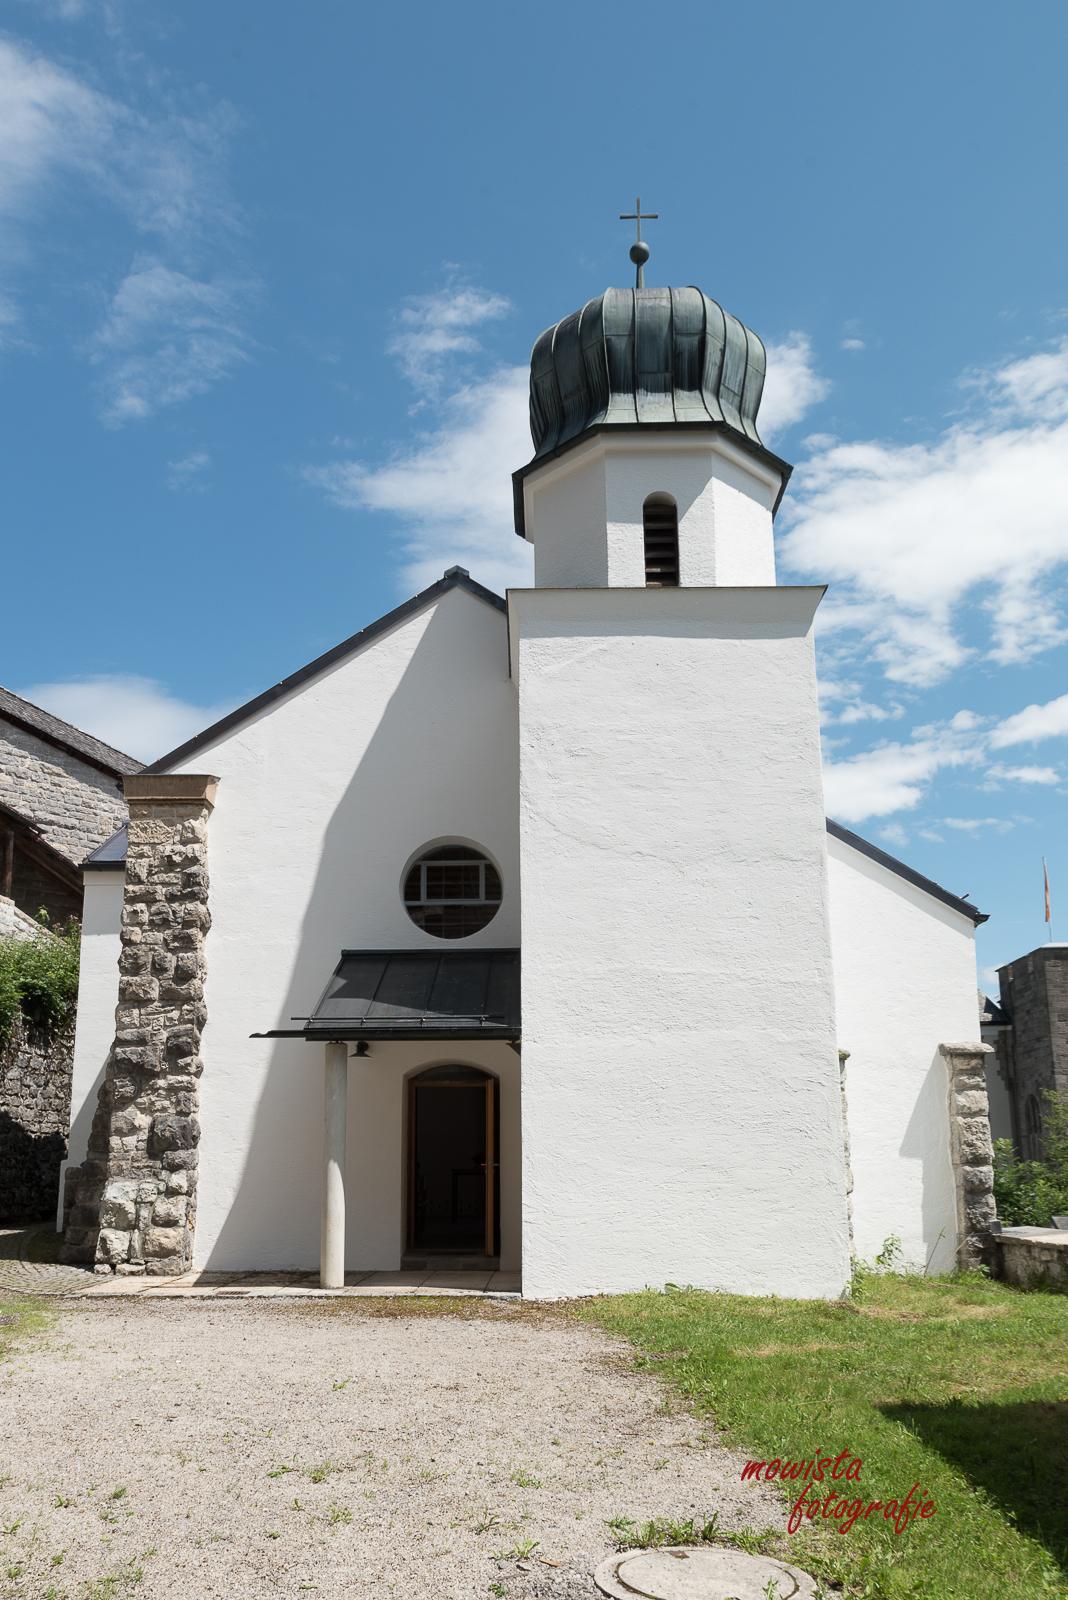 20170722_MW_DSC_5726_Schloss Ringberg